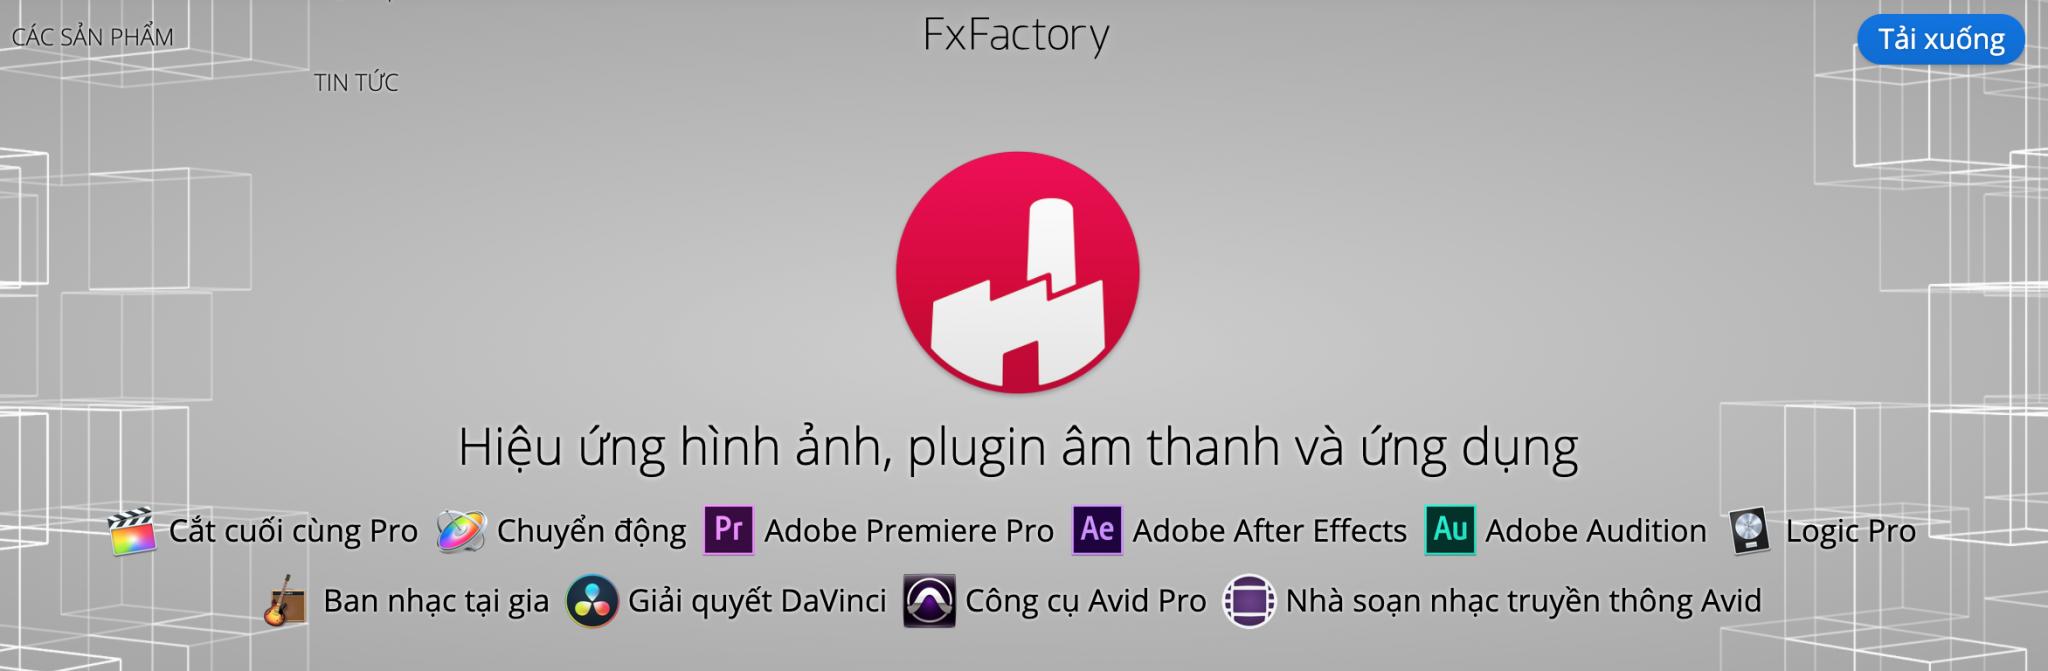 Final Cut Studio, Final Cut Express và Adobe After Effects